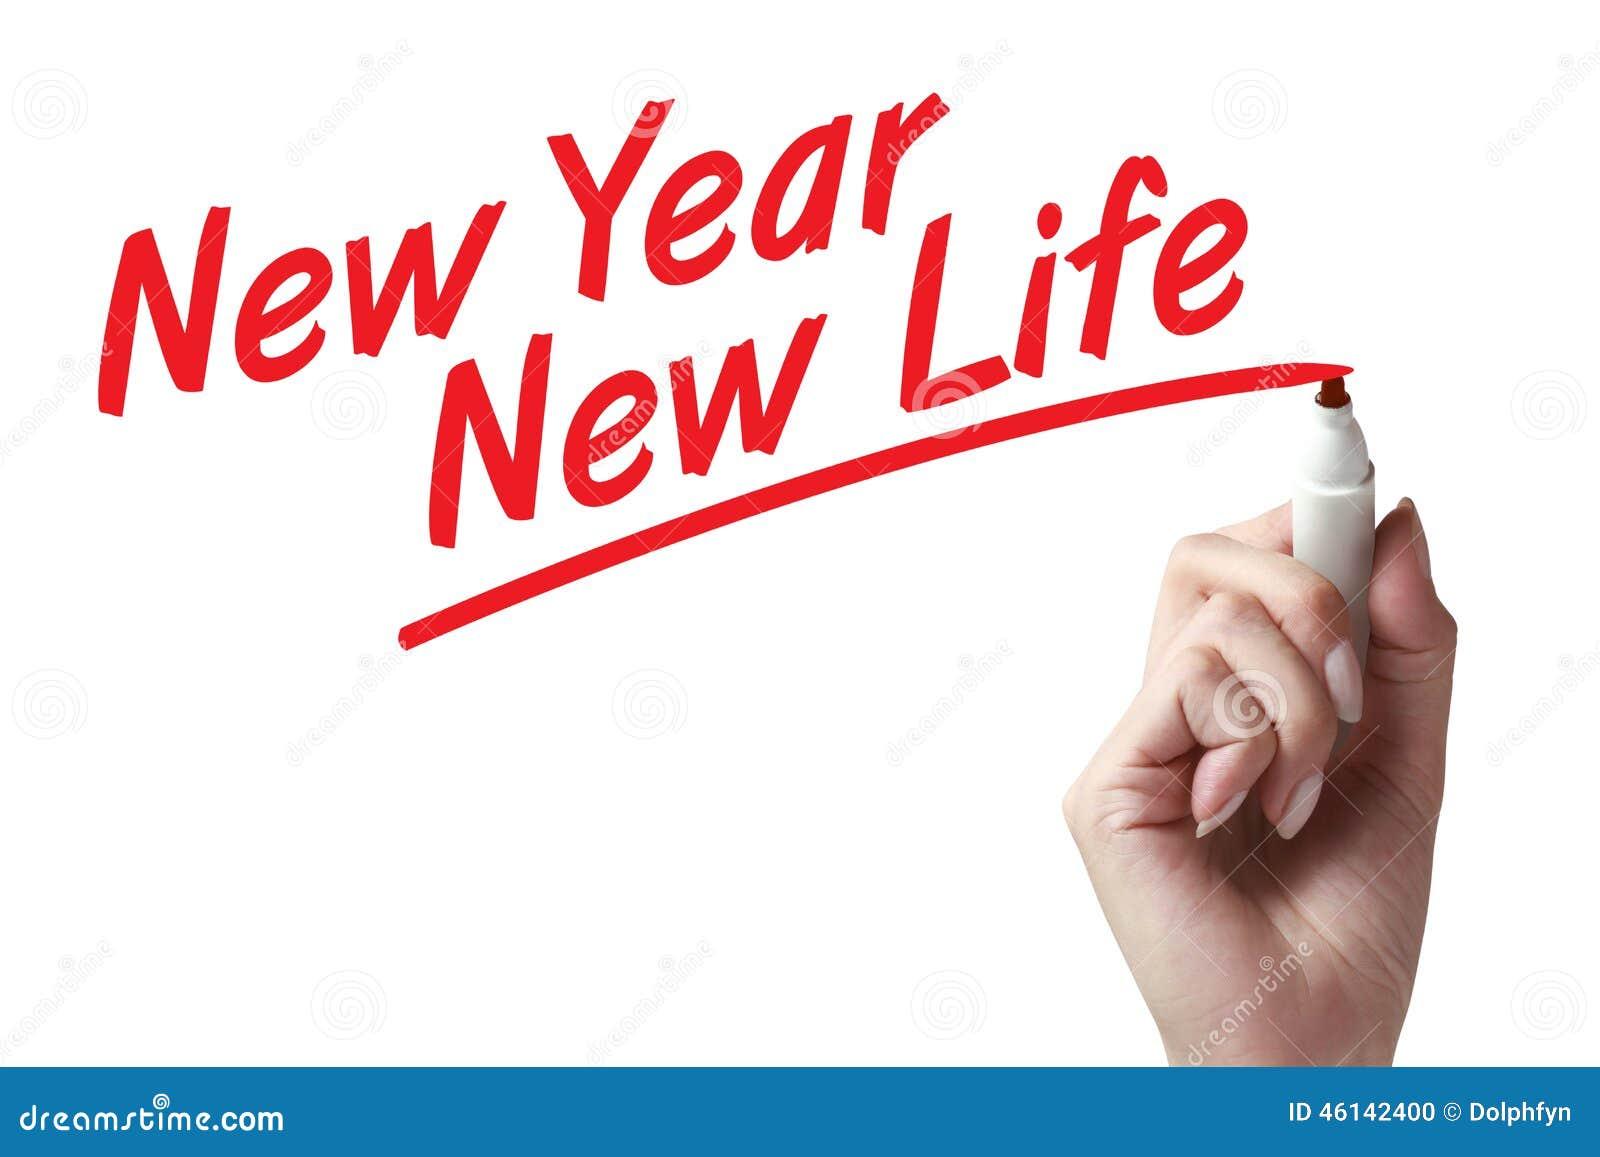 New year new life stock photo. Image of writing, life - 46142400